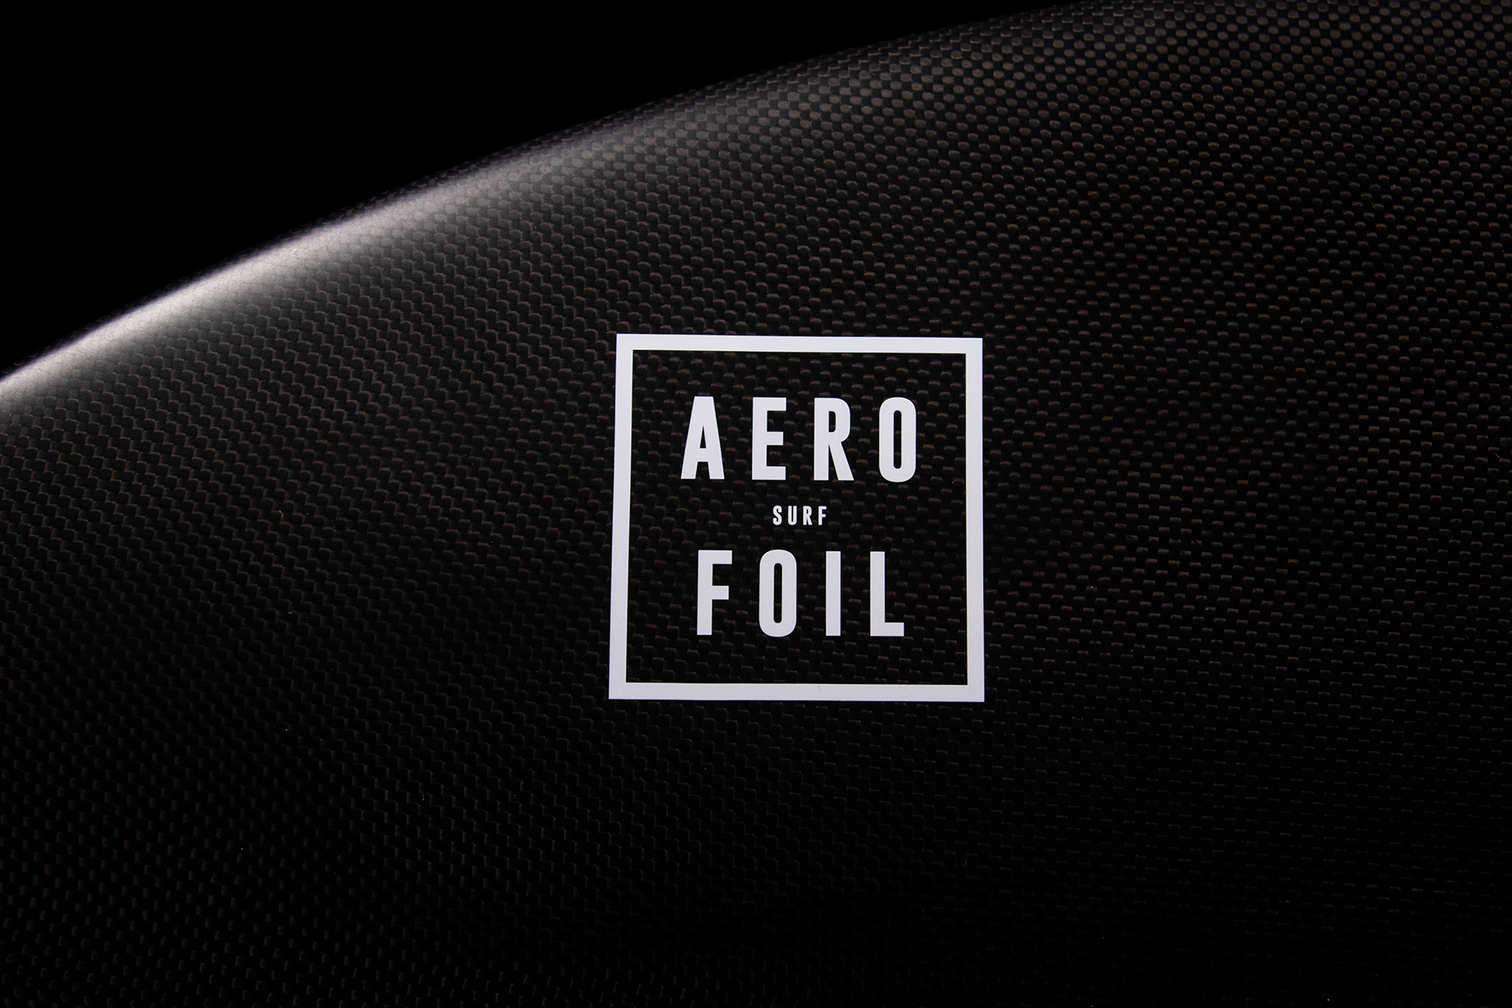 Aero Foil 2000 Long Fuselage